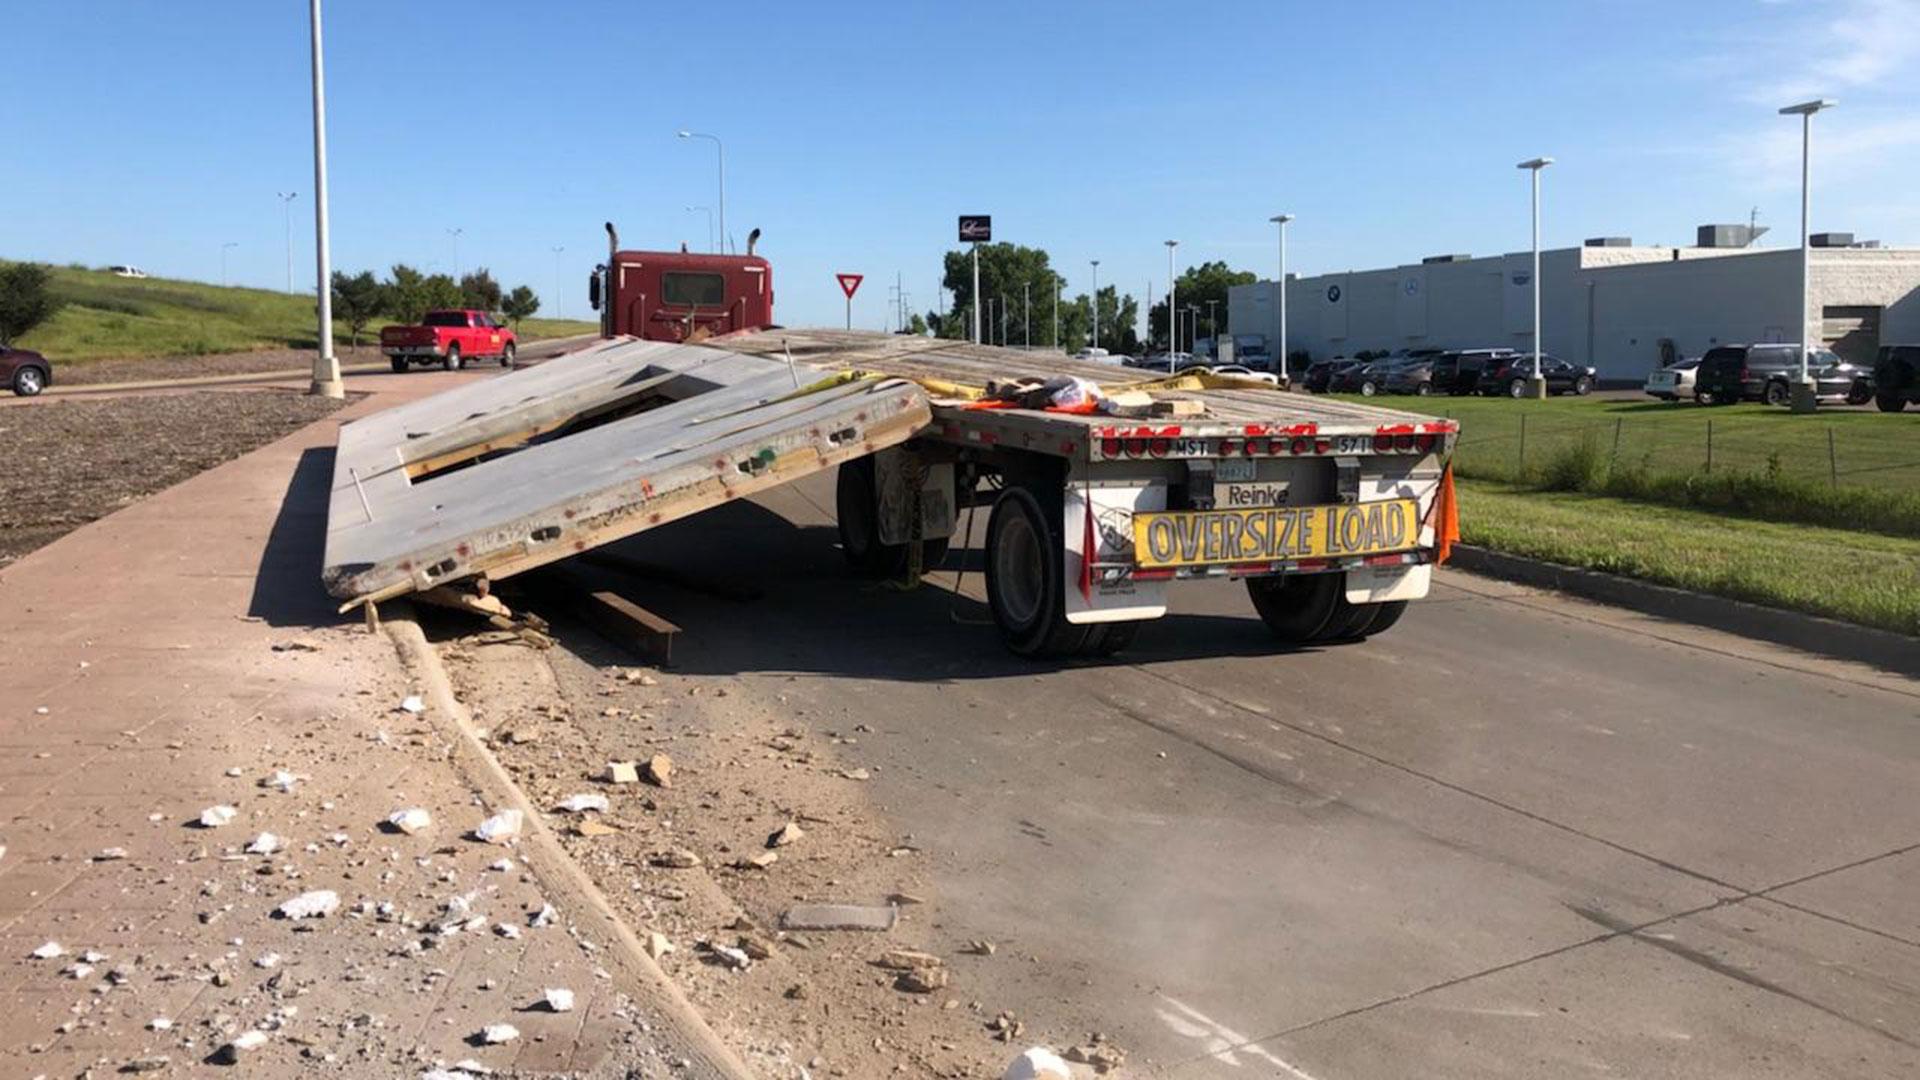 KELO uShare concrete slab crash